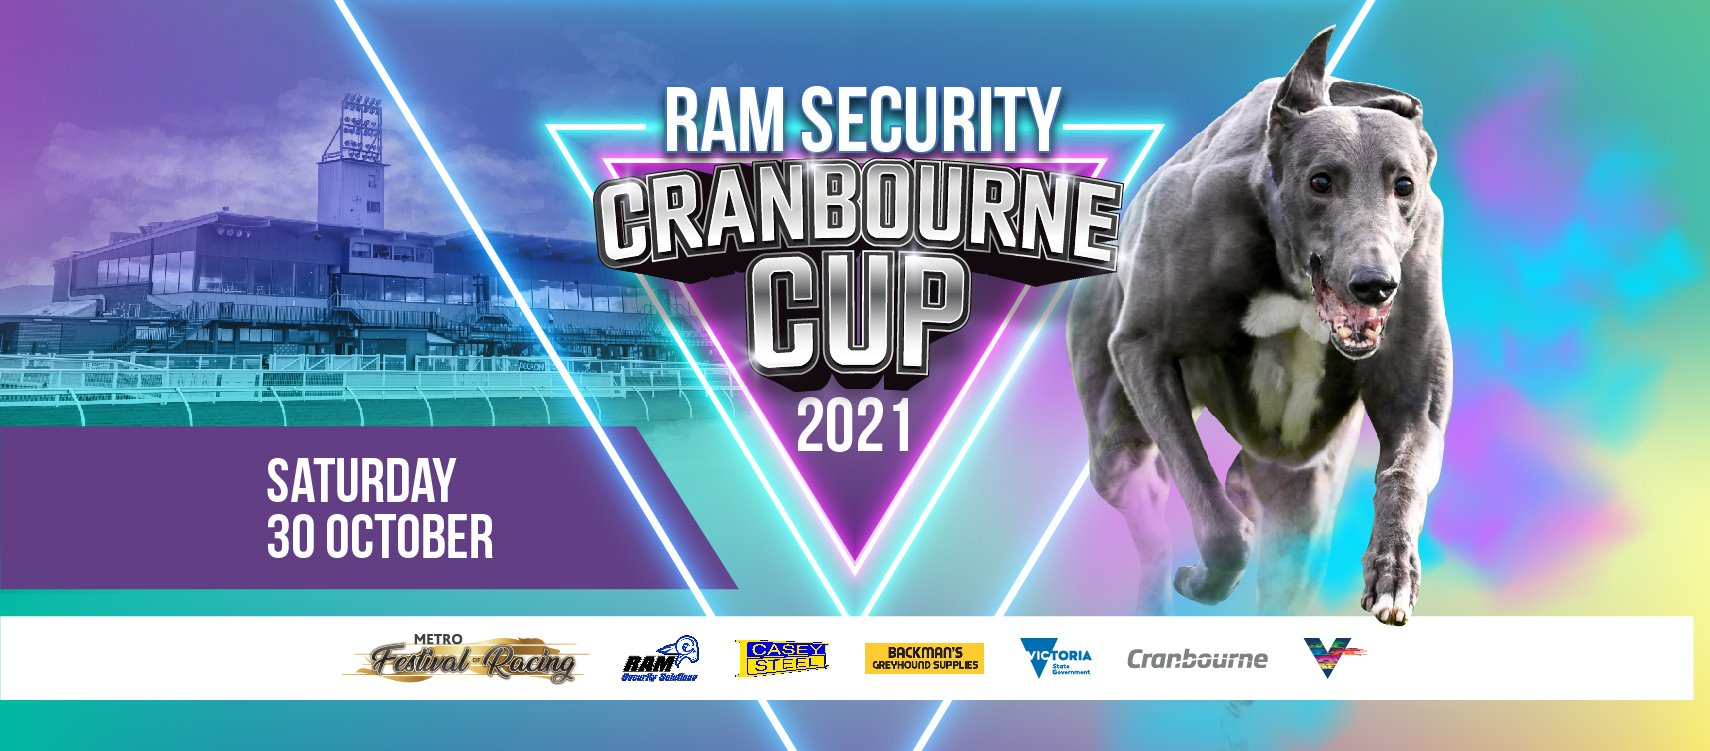 2021 Cranbourne Cup